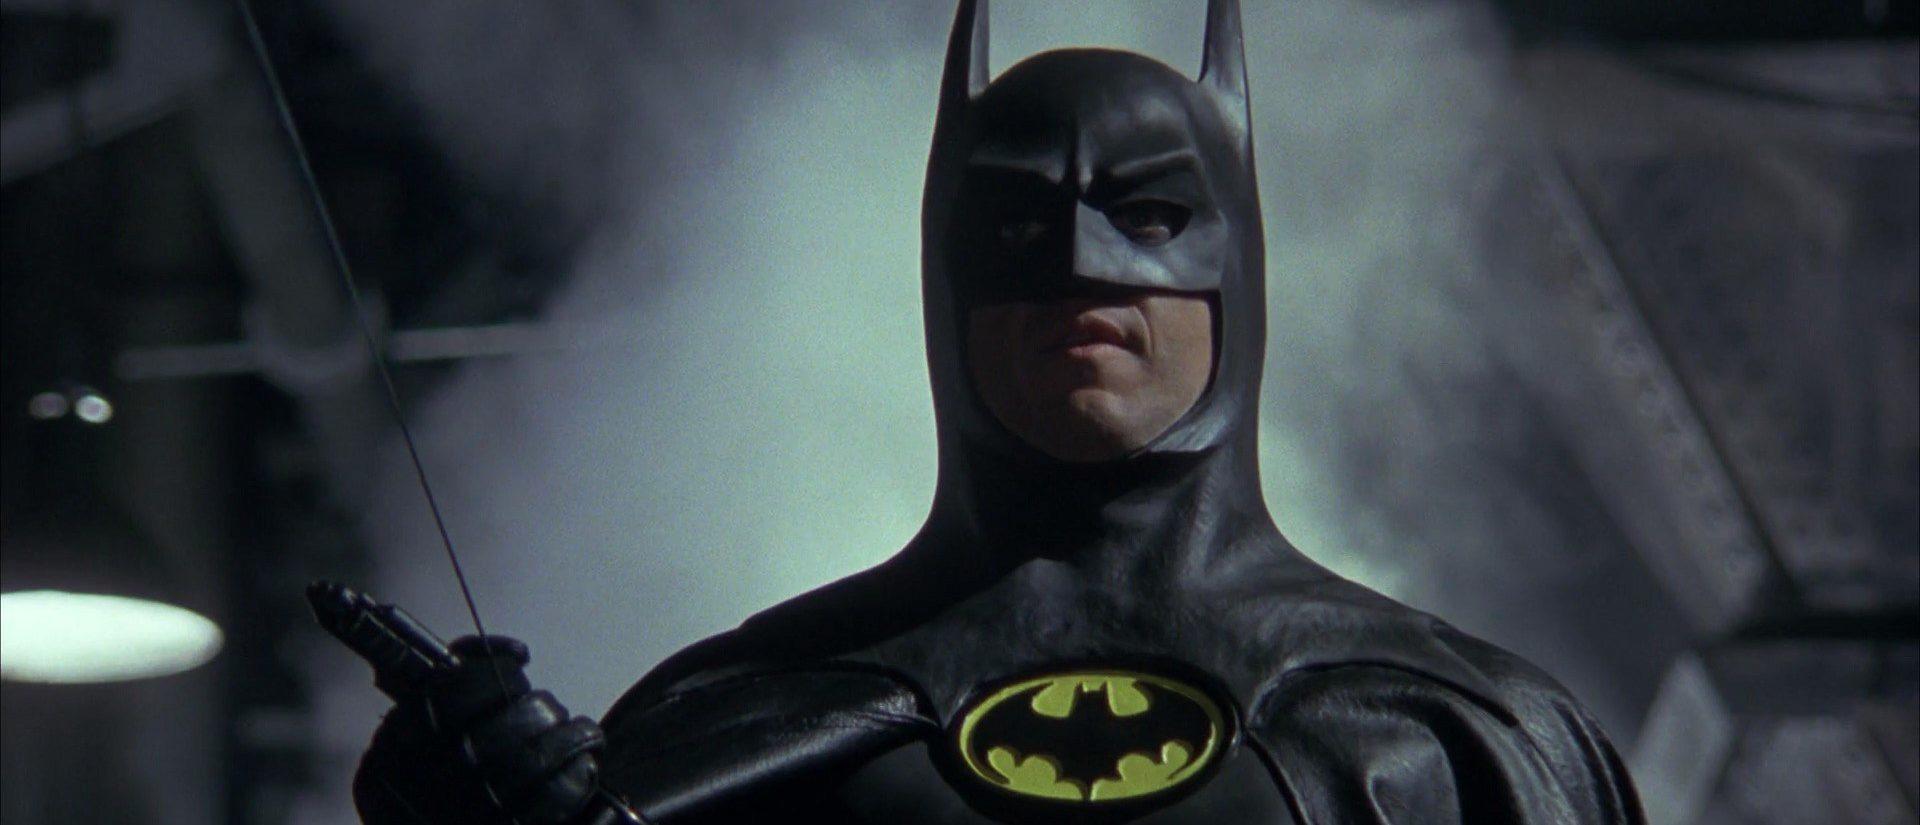 The Flash Wayne Manor Set Photos Tease Michael Keaton's Return to the Gotham of Batman '89